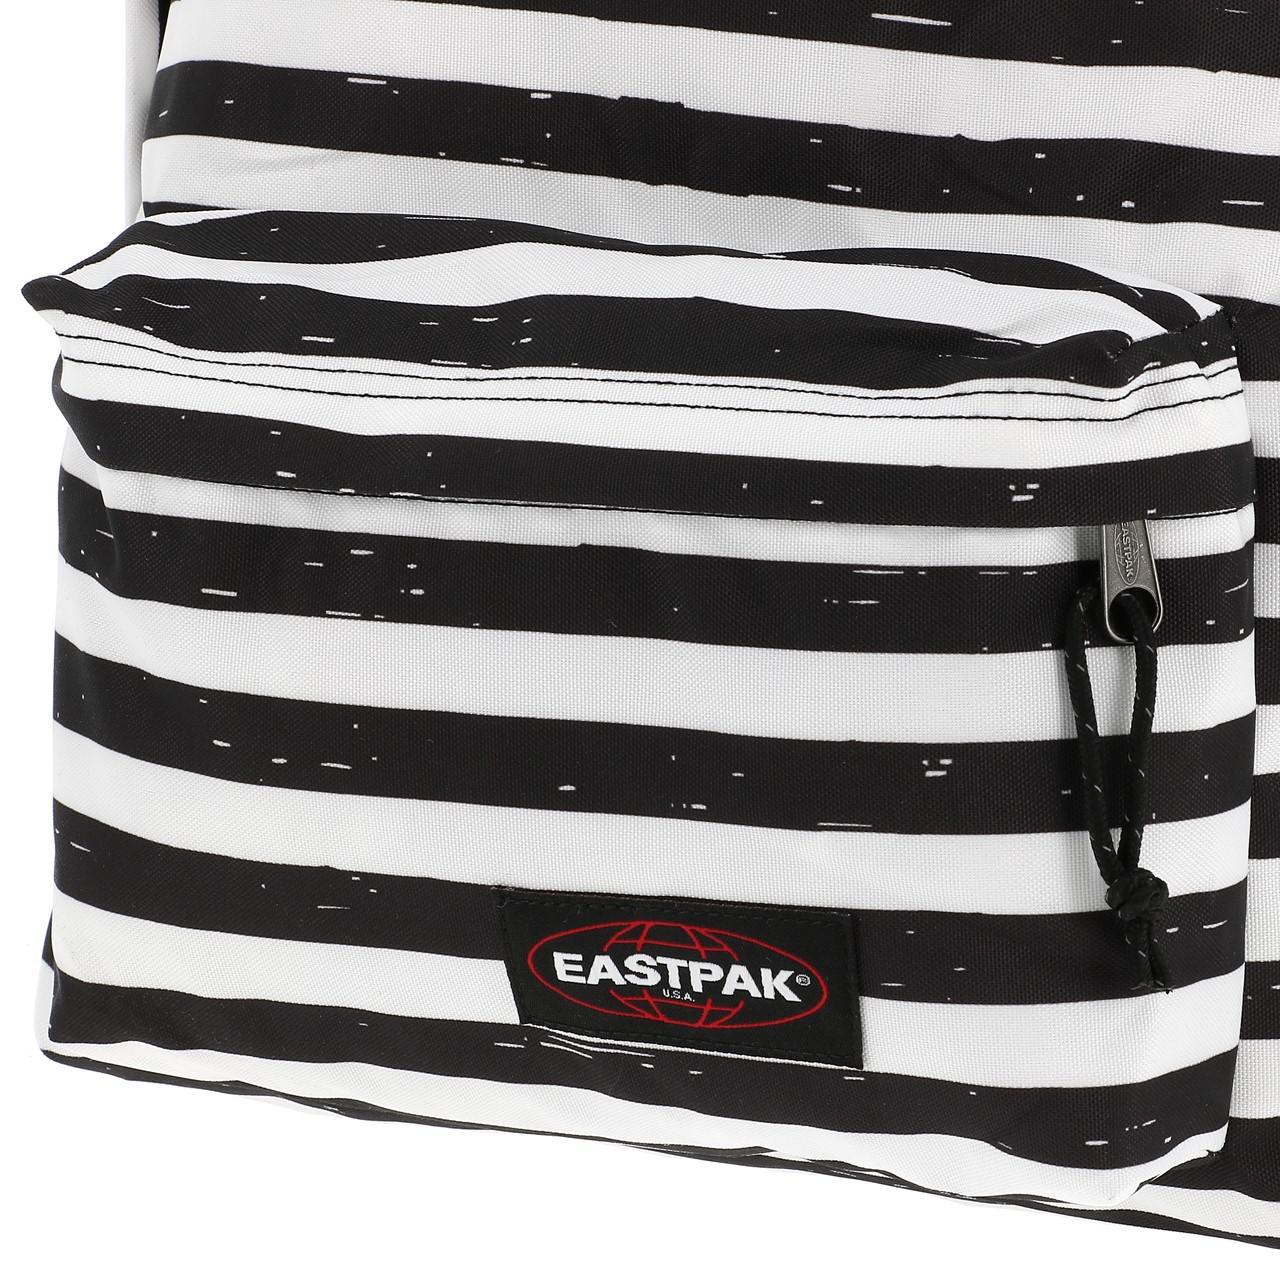 Sac-a-dos-college-Eastpak-Padded-strip-it-black-24l-Noir-70406-Neuf miniature 3